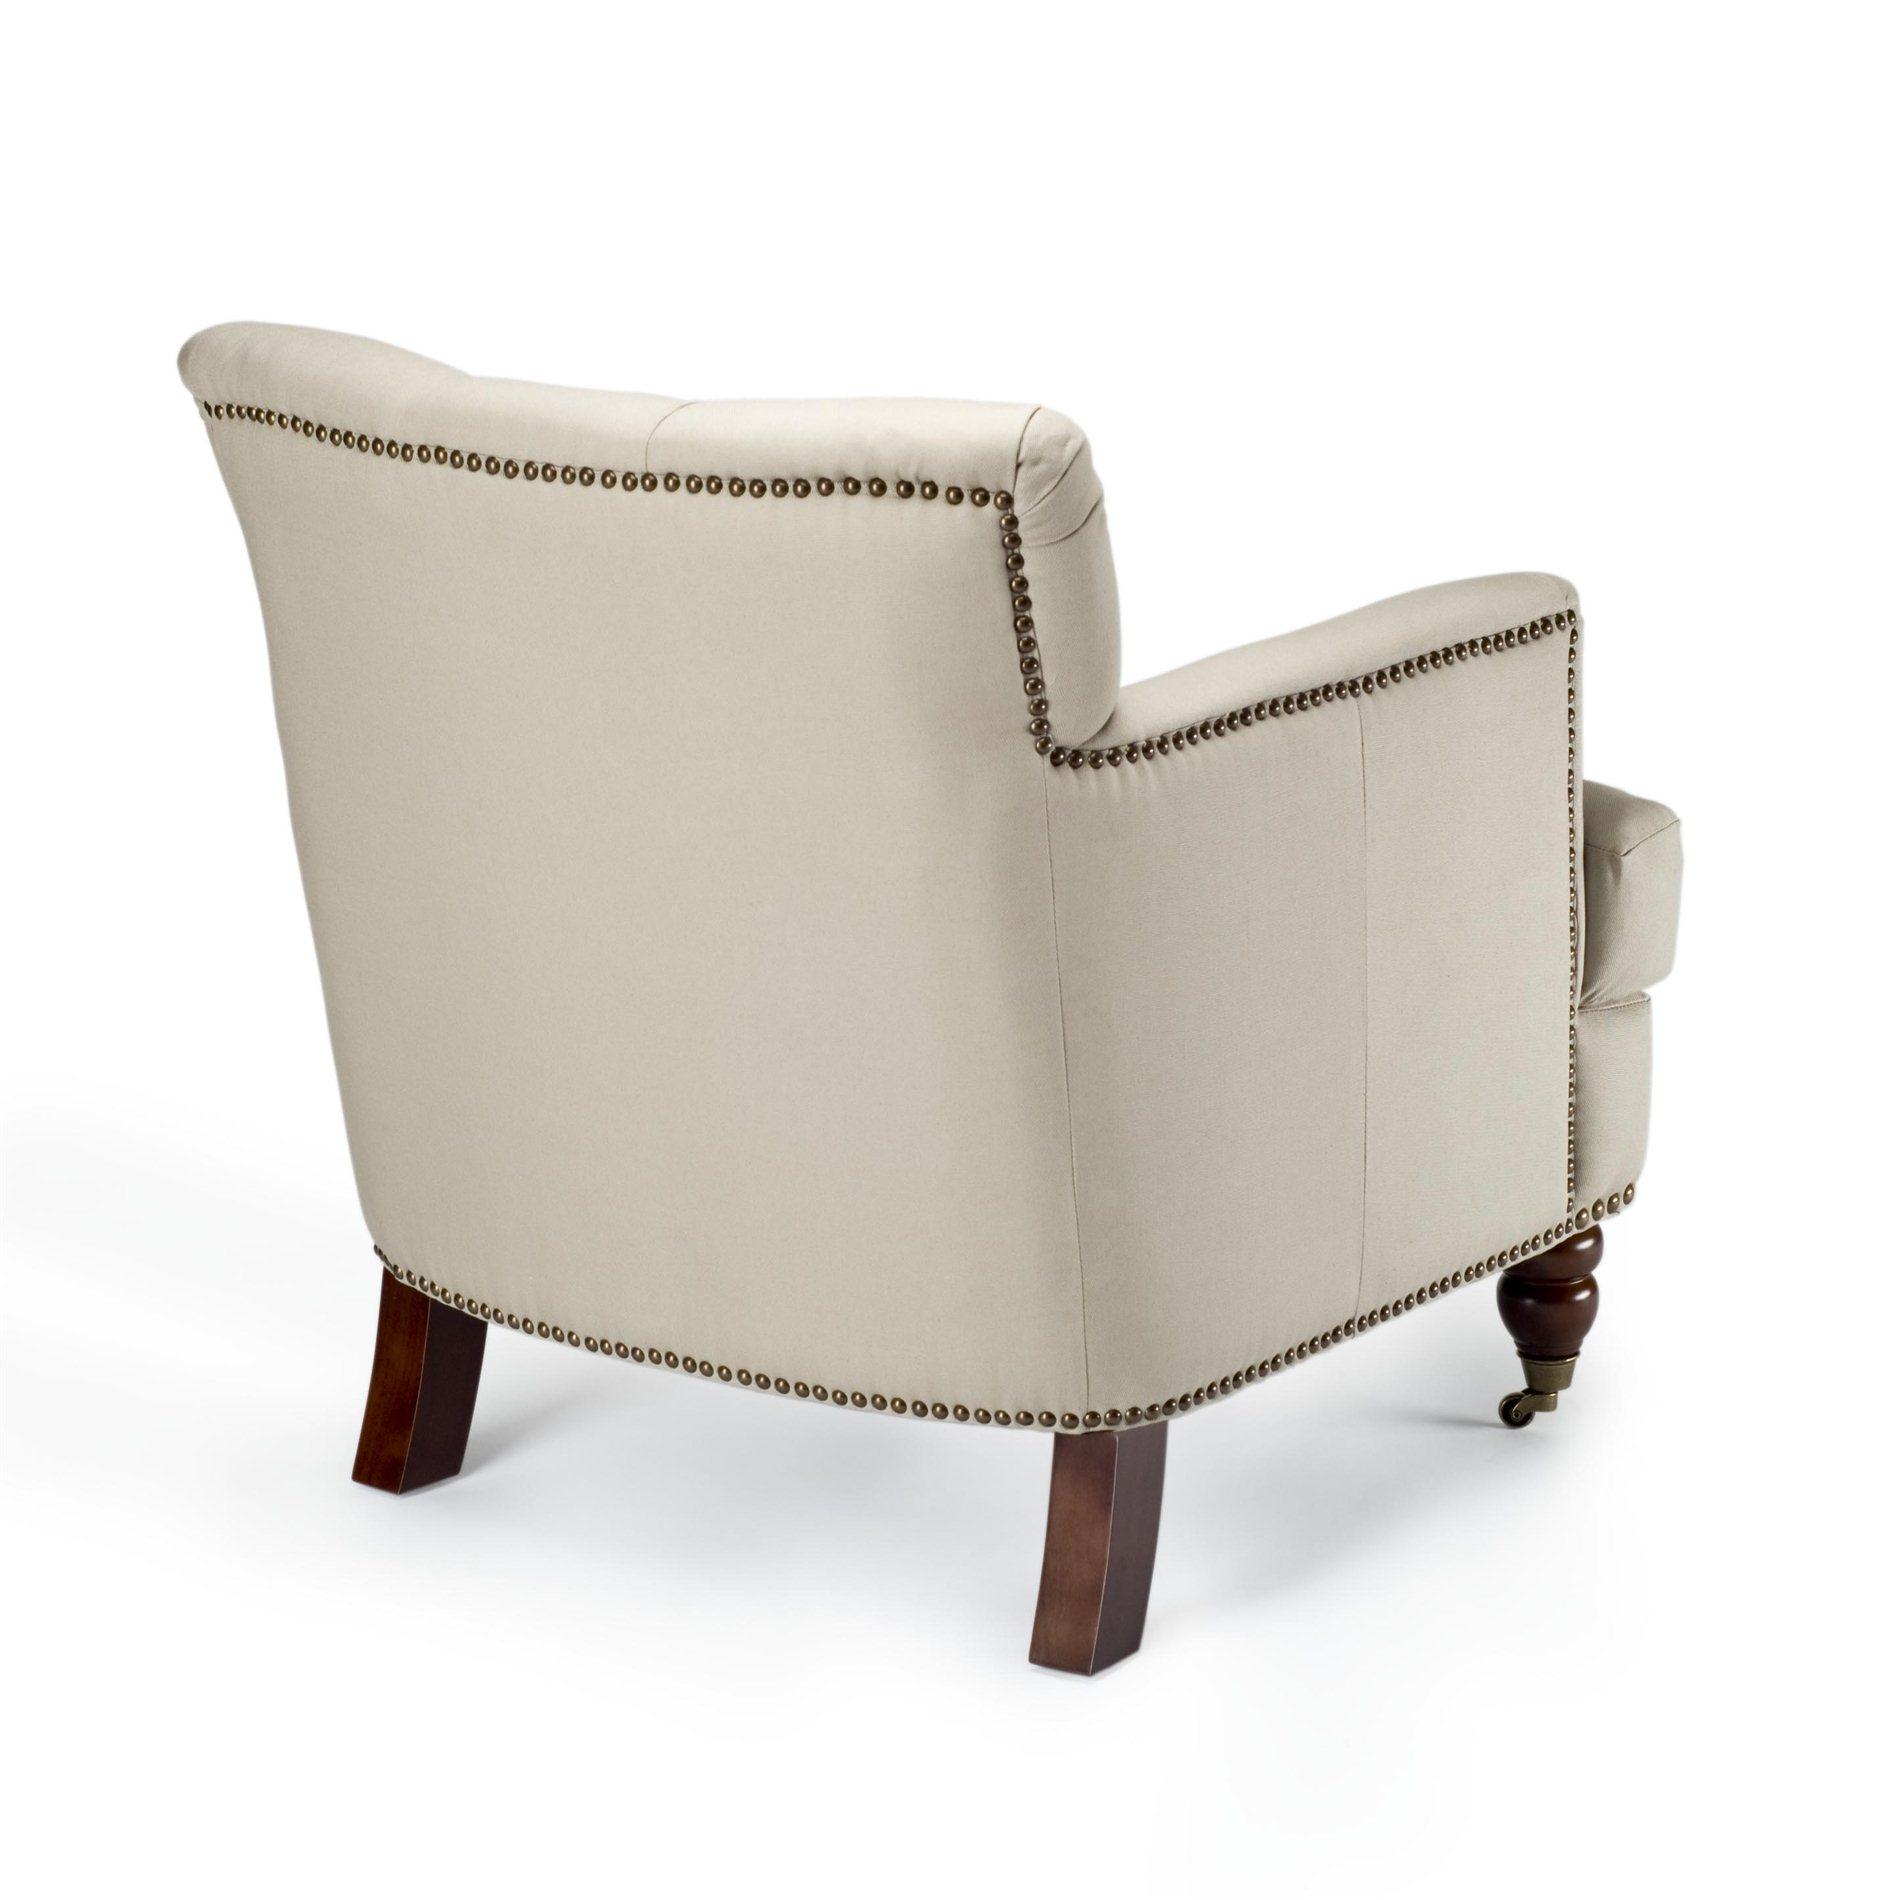 safavieh colin tufted club chair bedroom mirror hud8212a sfv